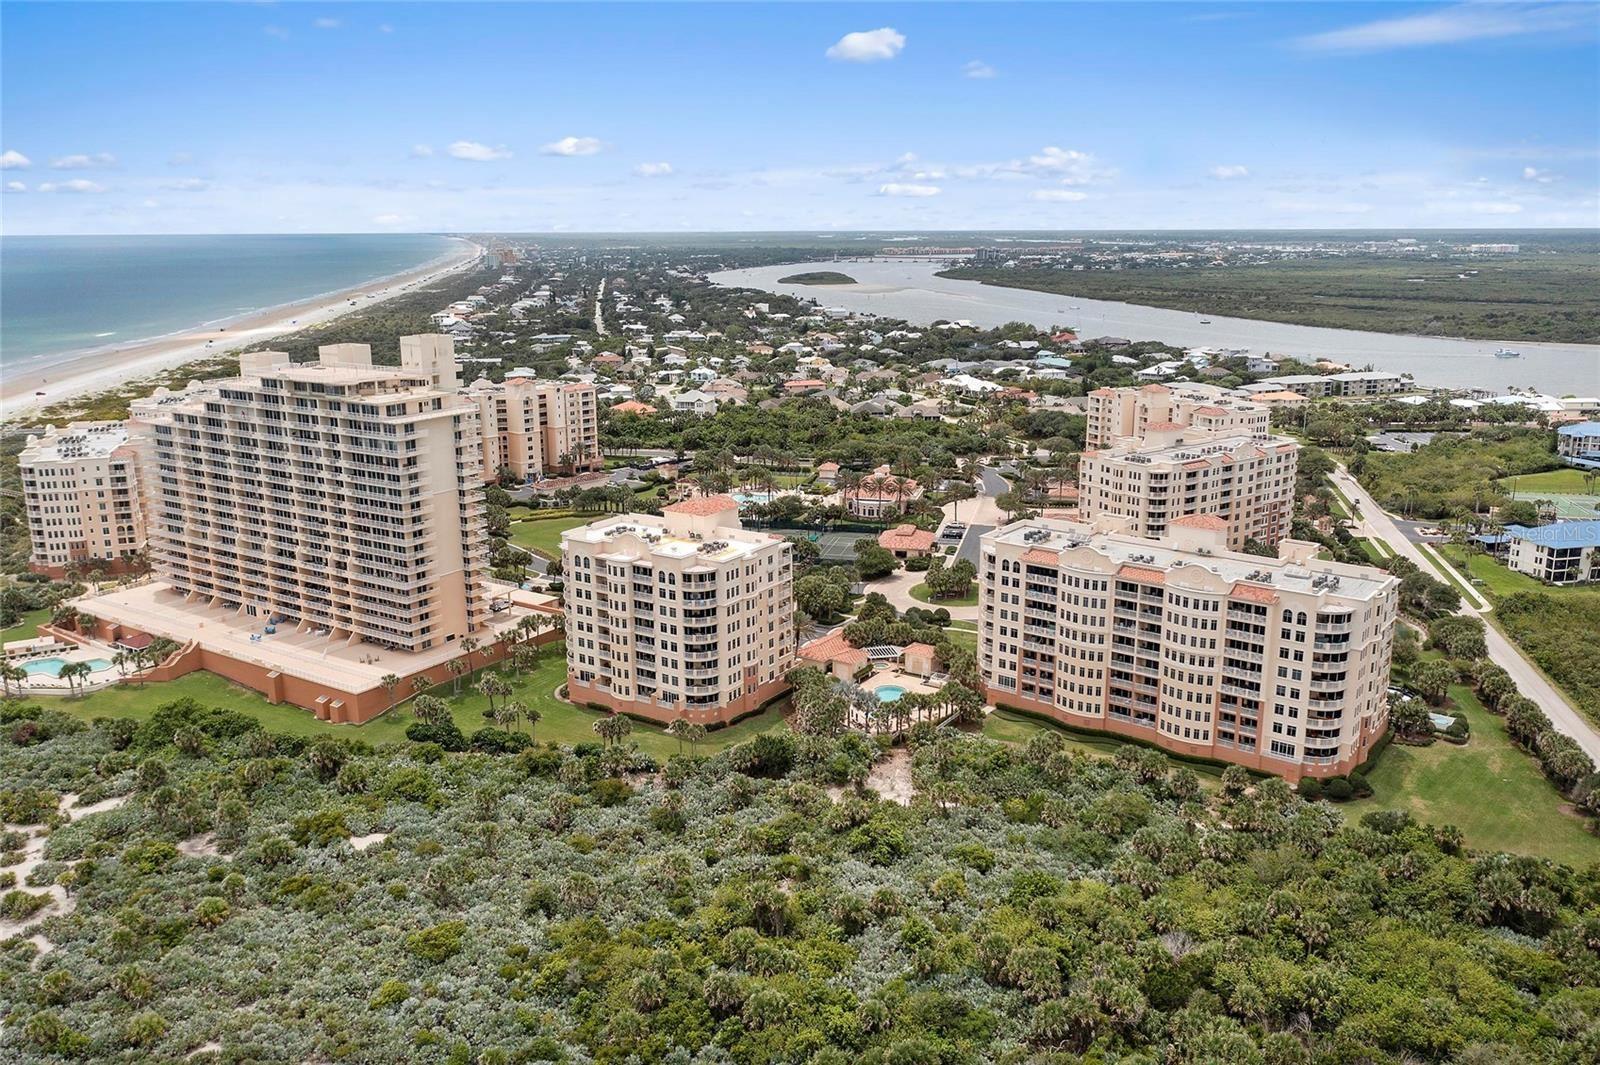 Photo of 261 MINORCA BEACH WAY #401, NEW SMYRNA BEACH, FL 32169 (MLS # O5942895)